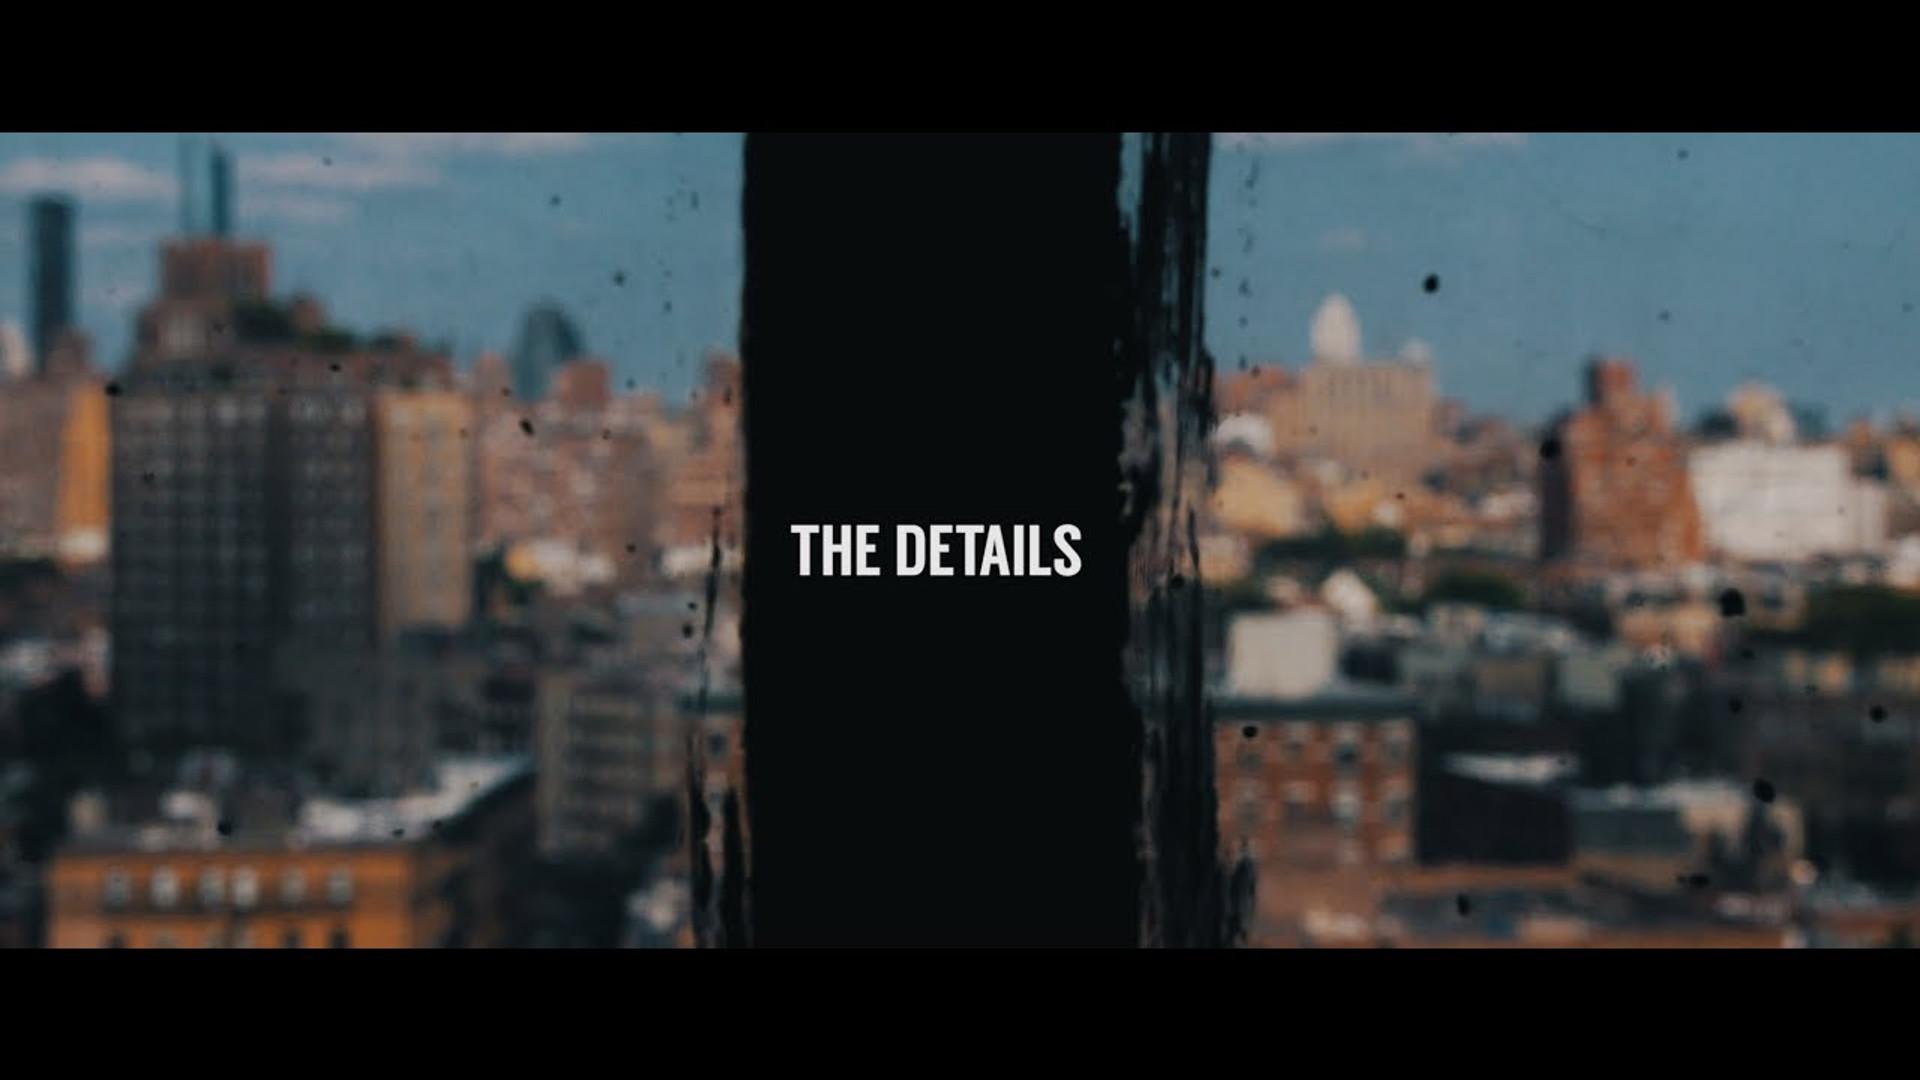 The Details (Short Film)